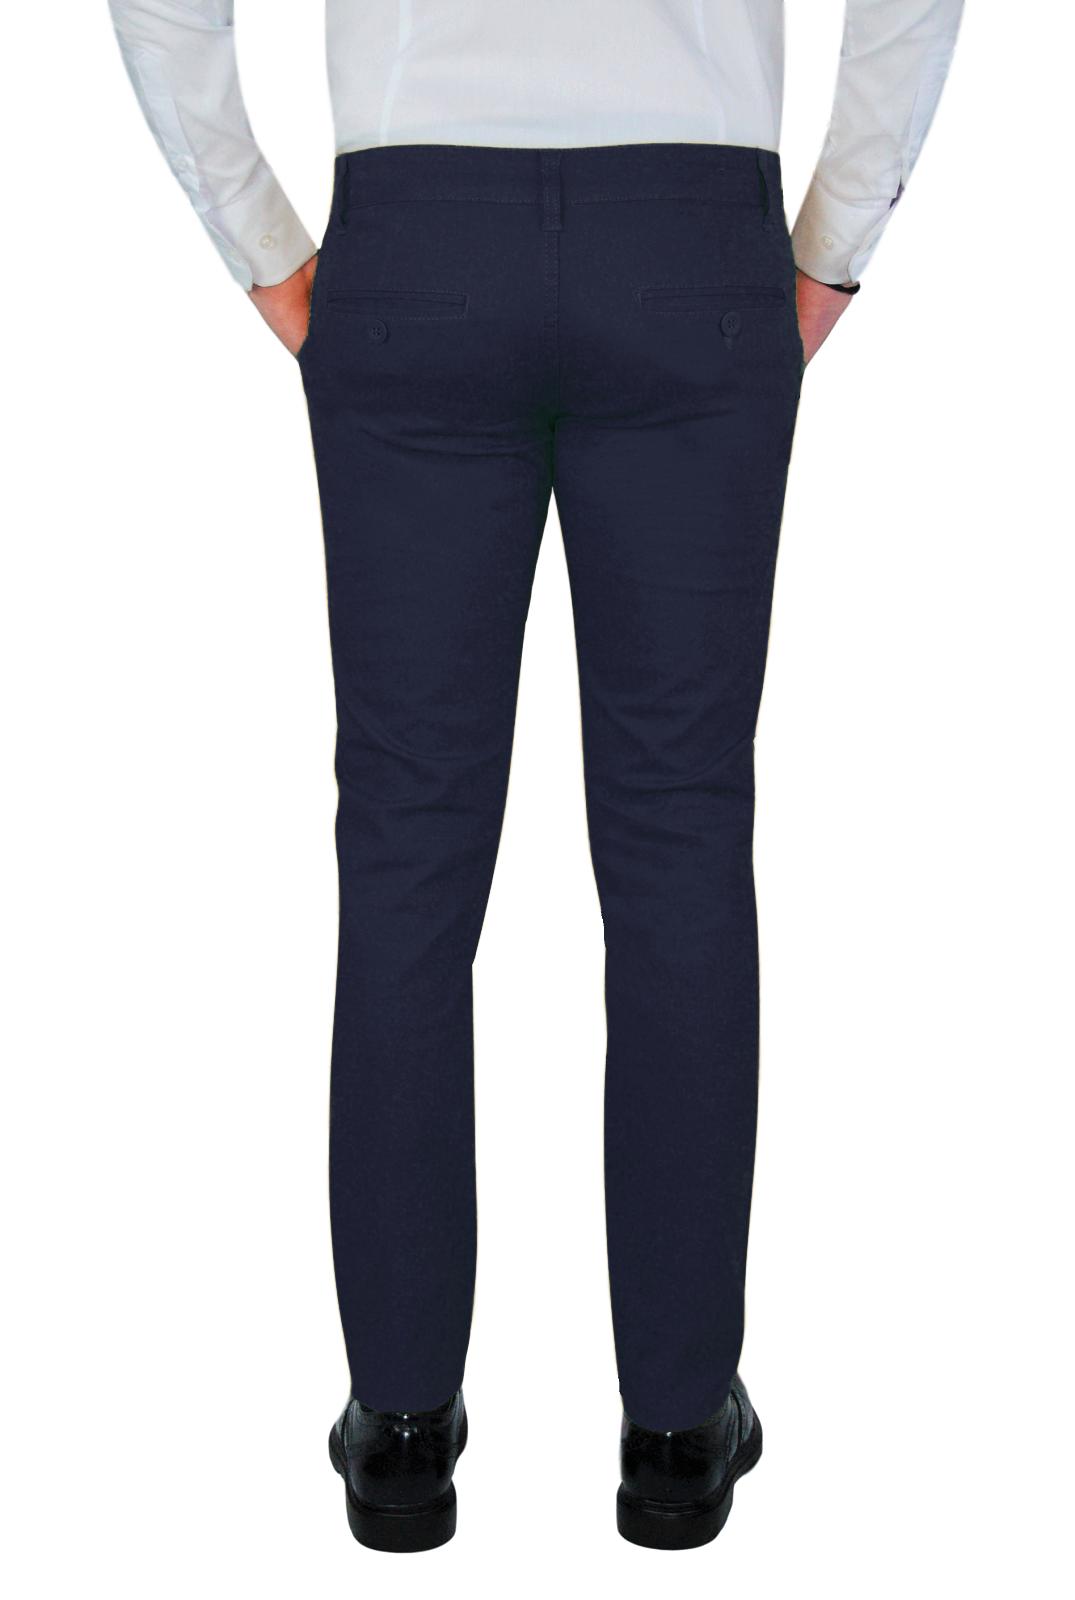 Pantalone-Uomo-Chino-Primaverile-slim-fit-Pantaloni-Eleganti-Blu-Verde-Nero miniatura 14